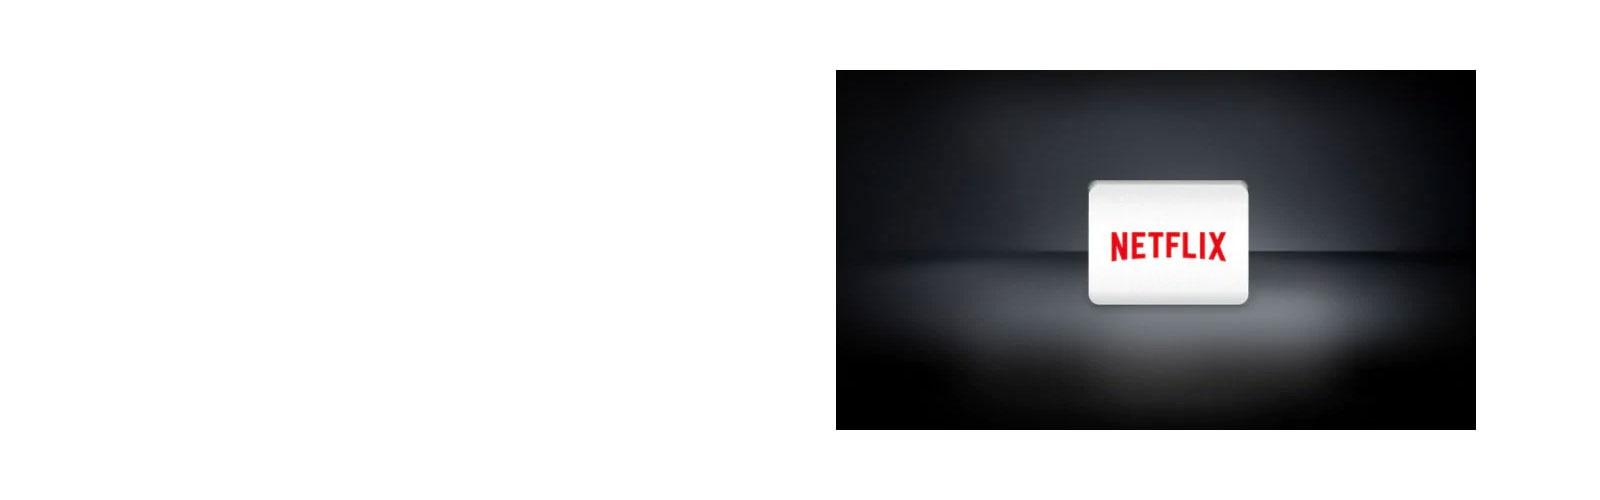 Logo Netflix tersusun secara horizontal dengan latar belakang hitam.